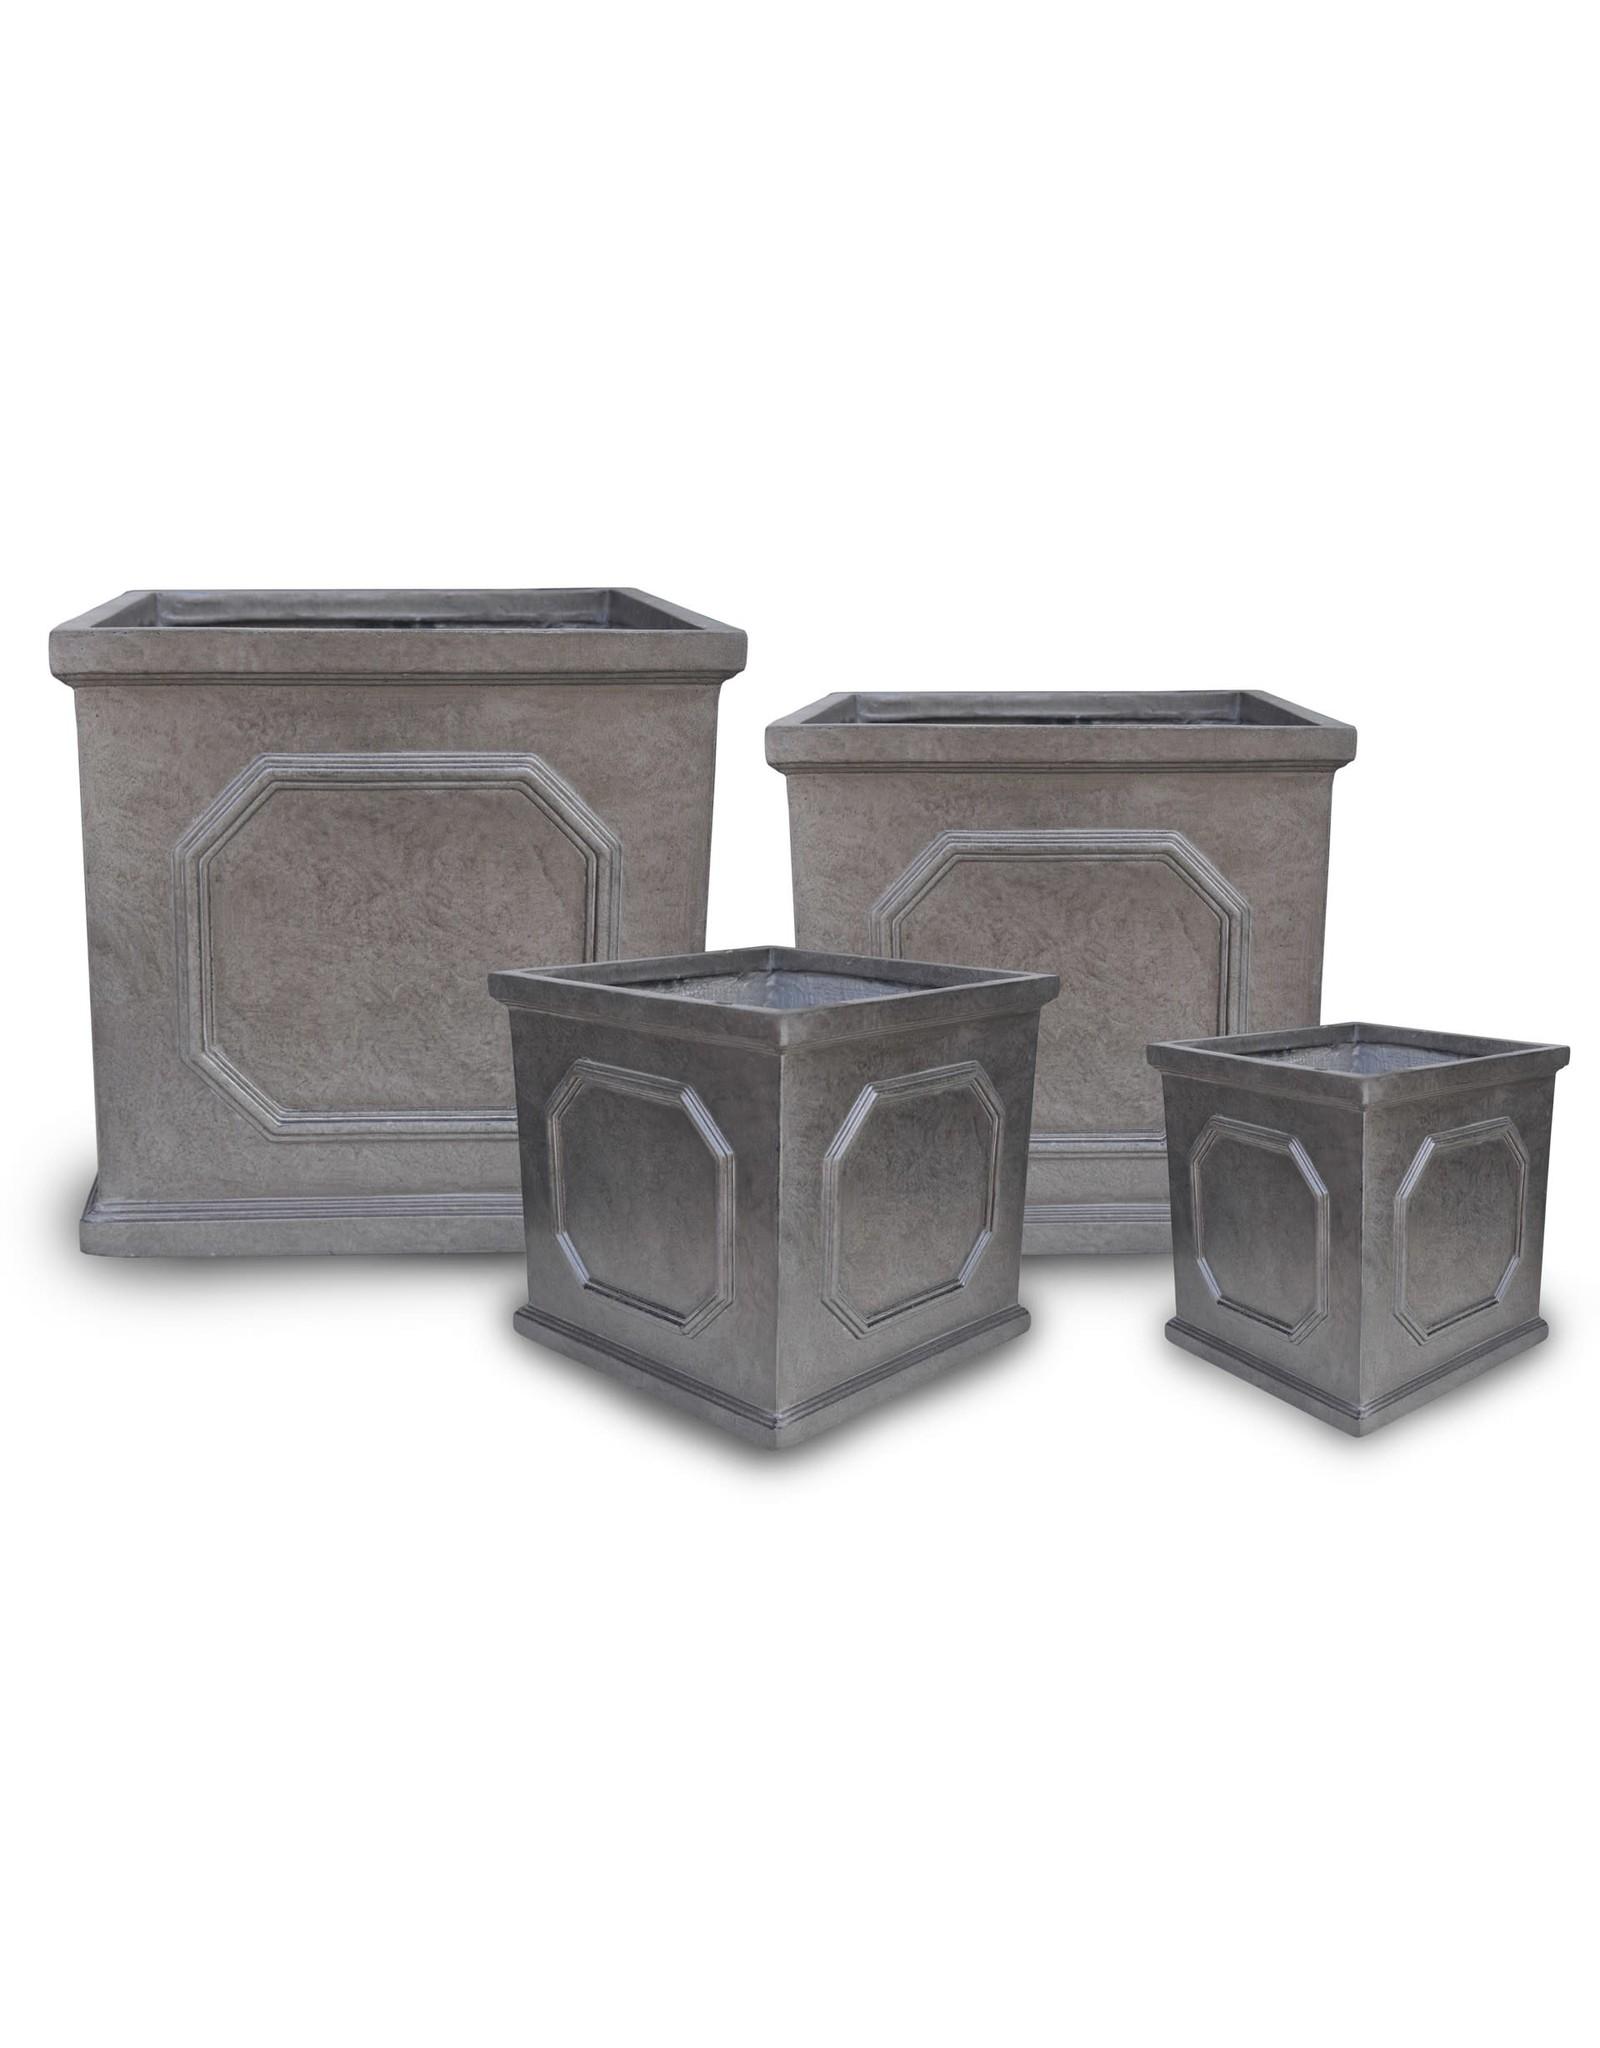 English Abbey Square Pot- Metallic- M